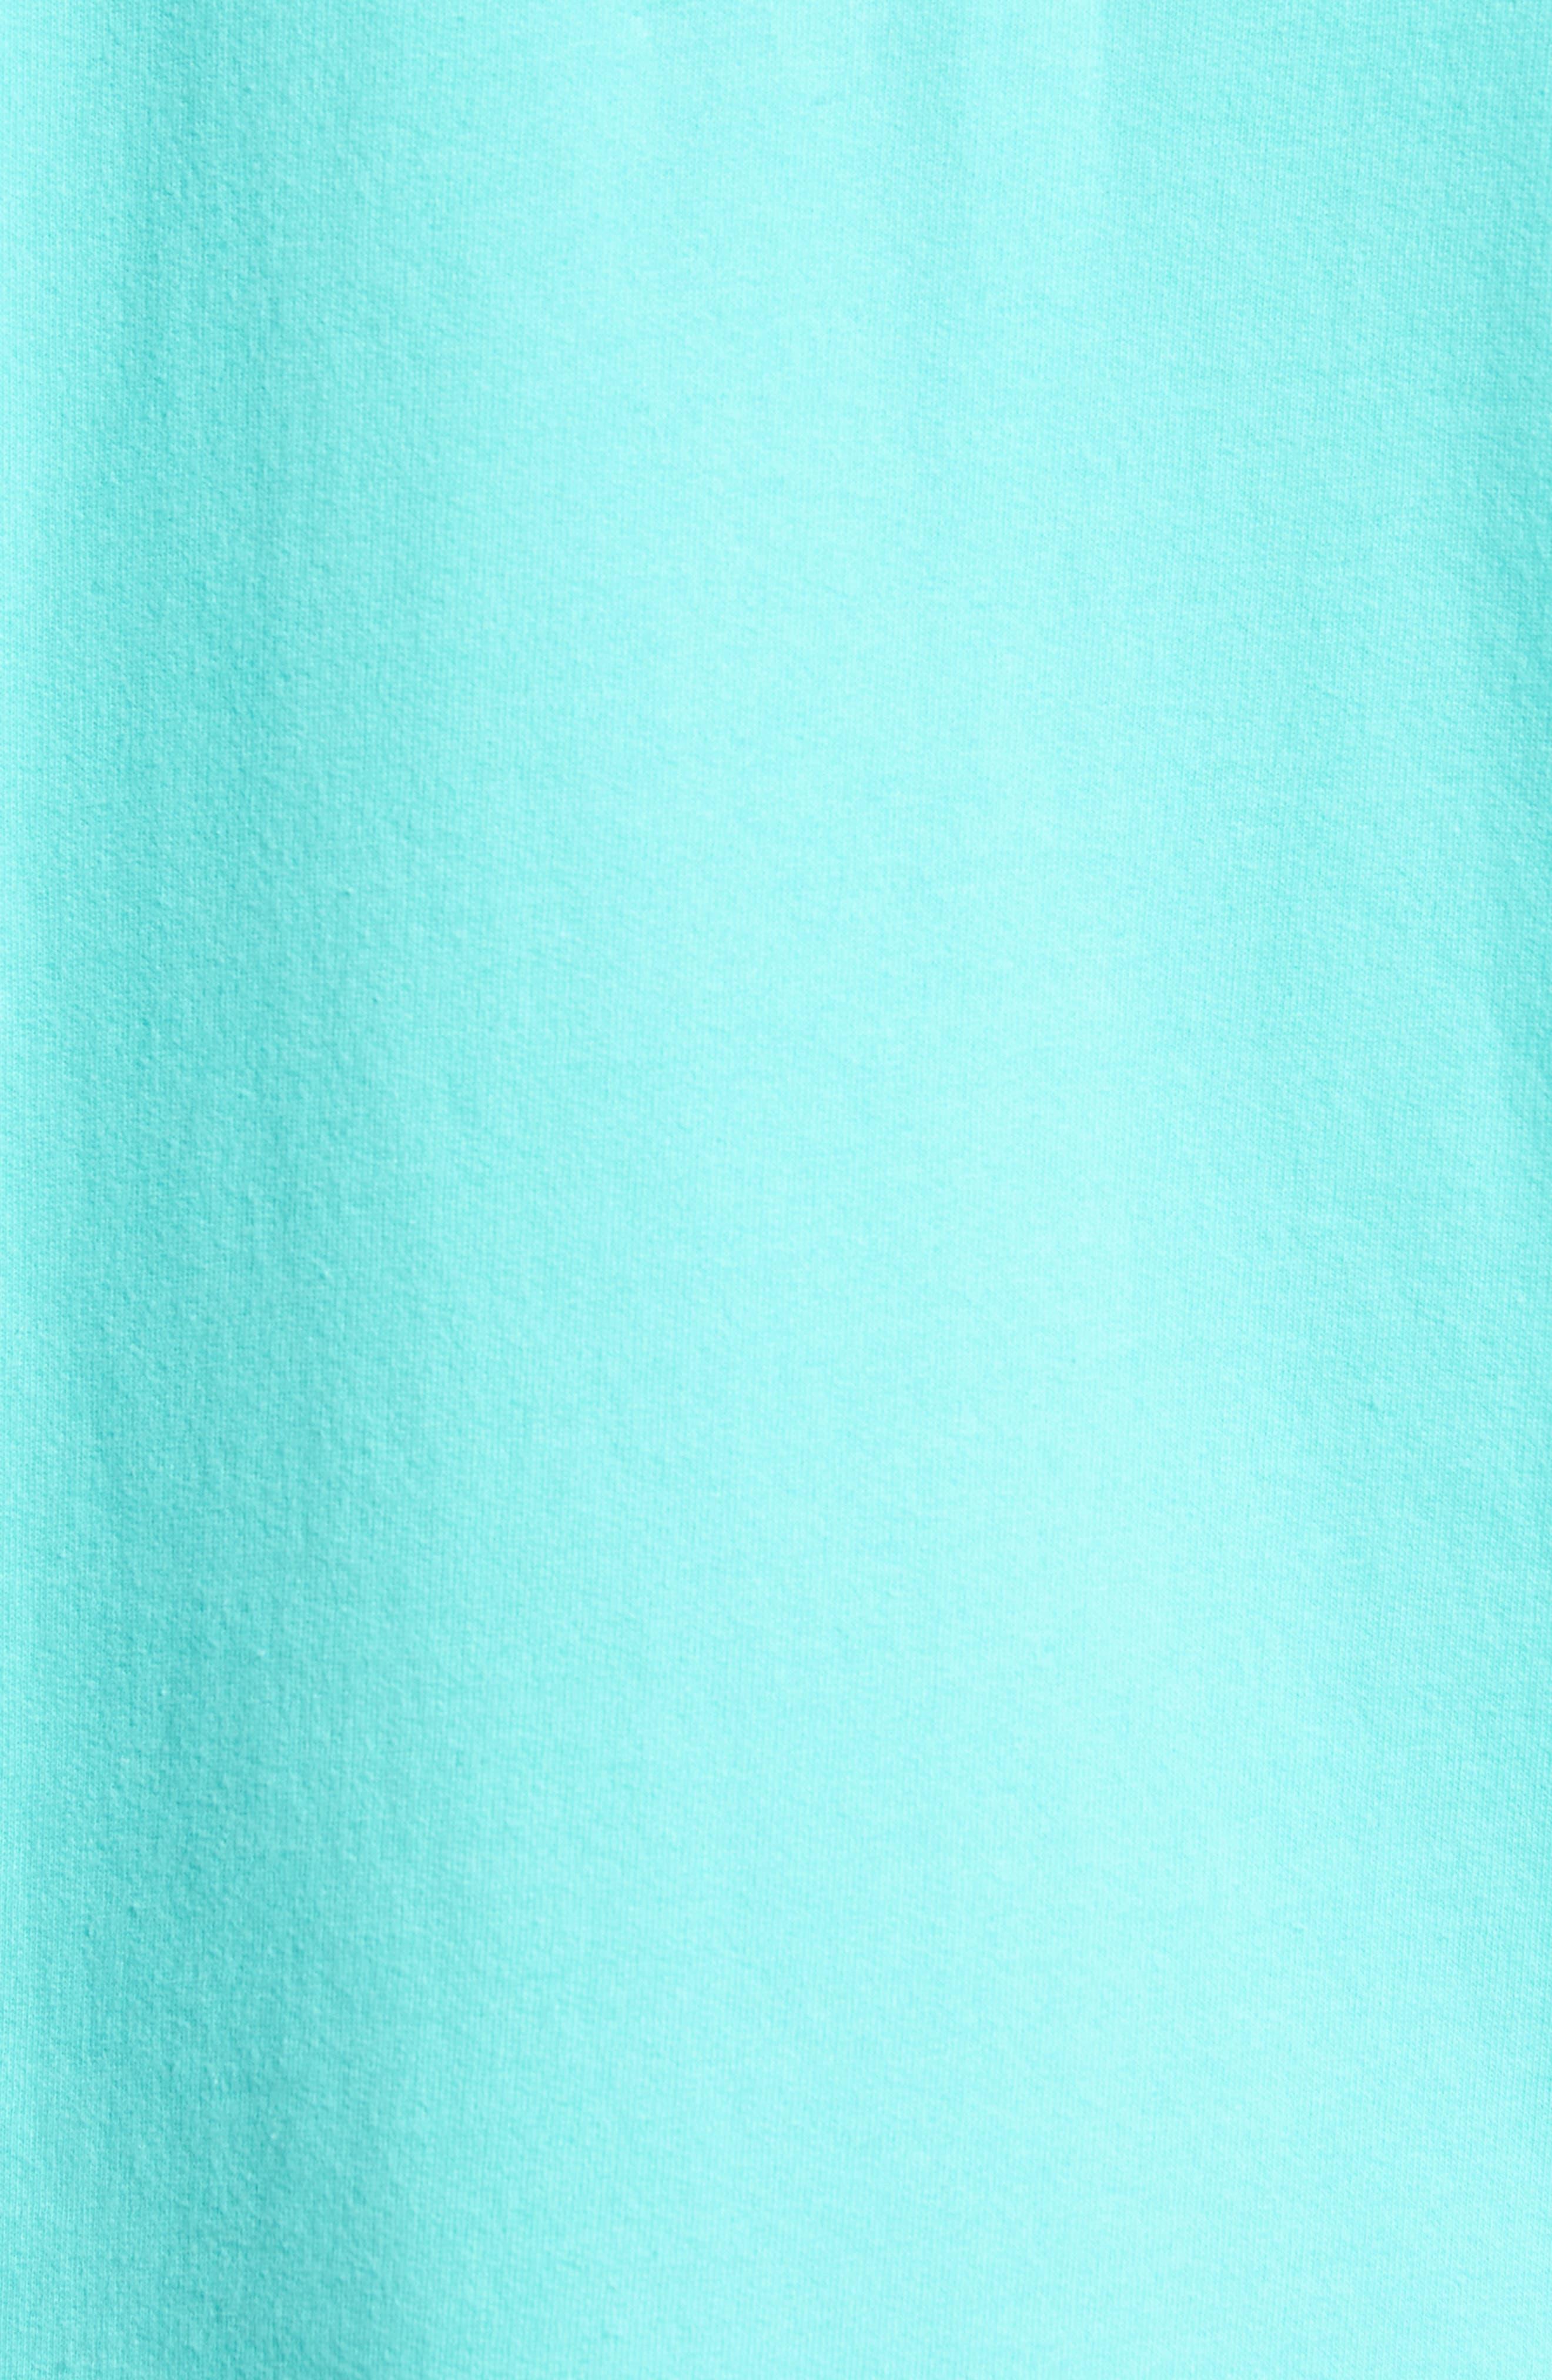 Colorblock Quarter Zip Sweatshirt,                             Alternate thumbnail 5, color,                             900